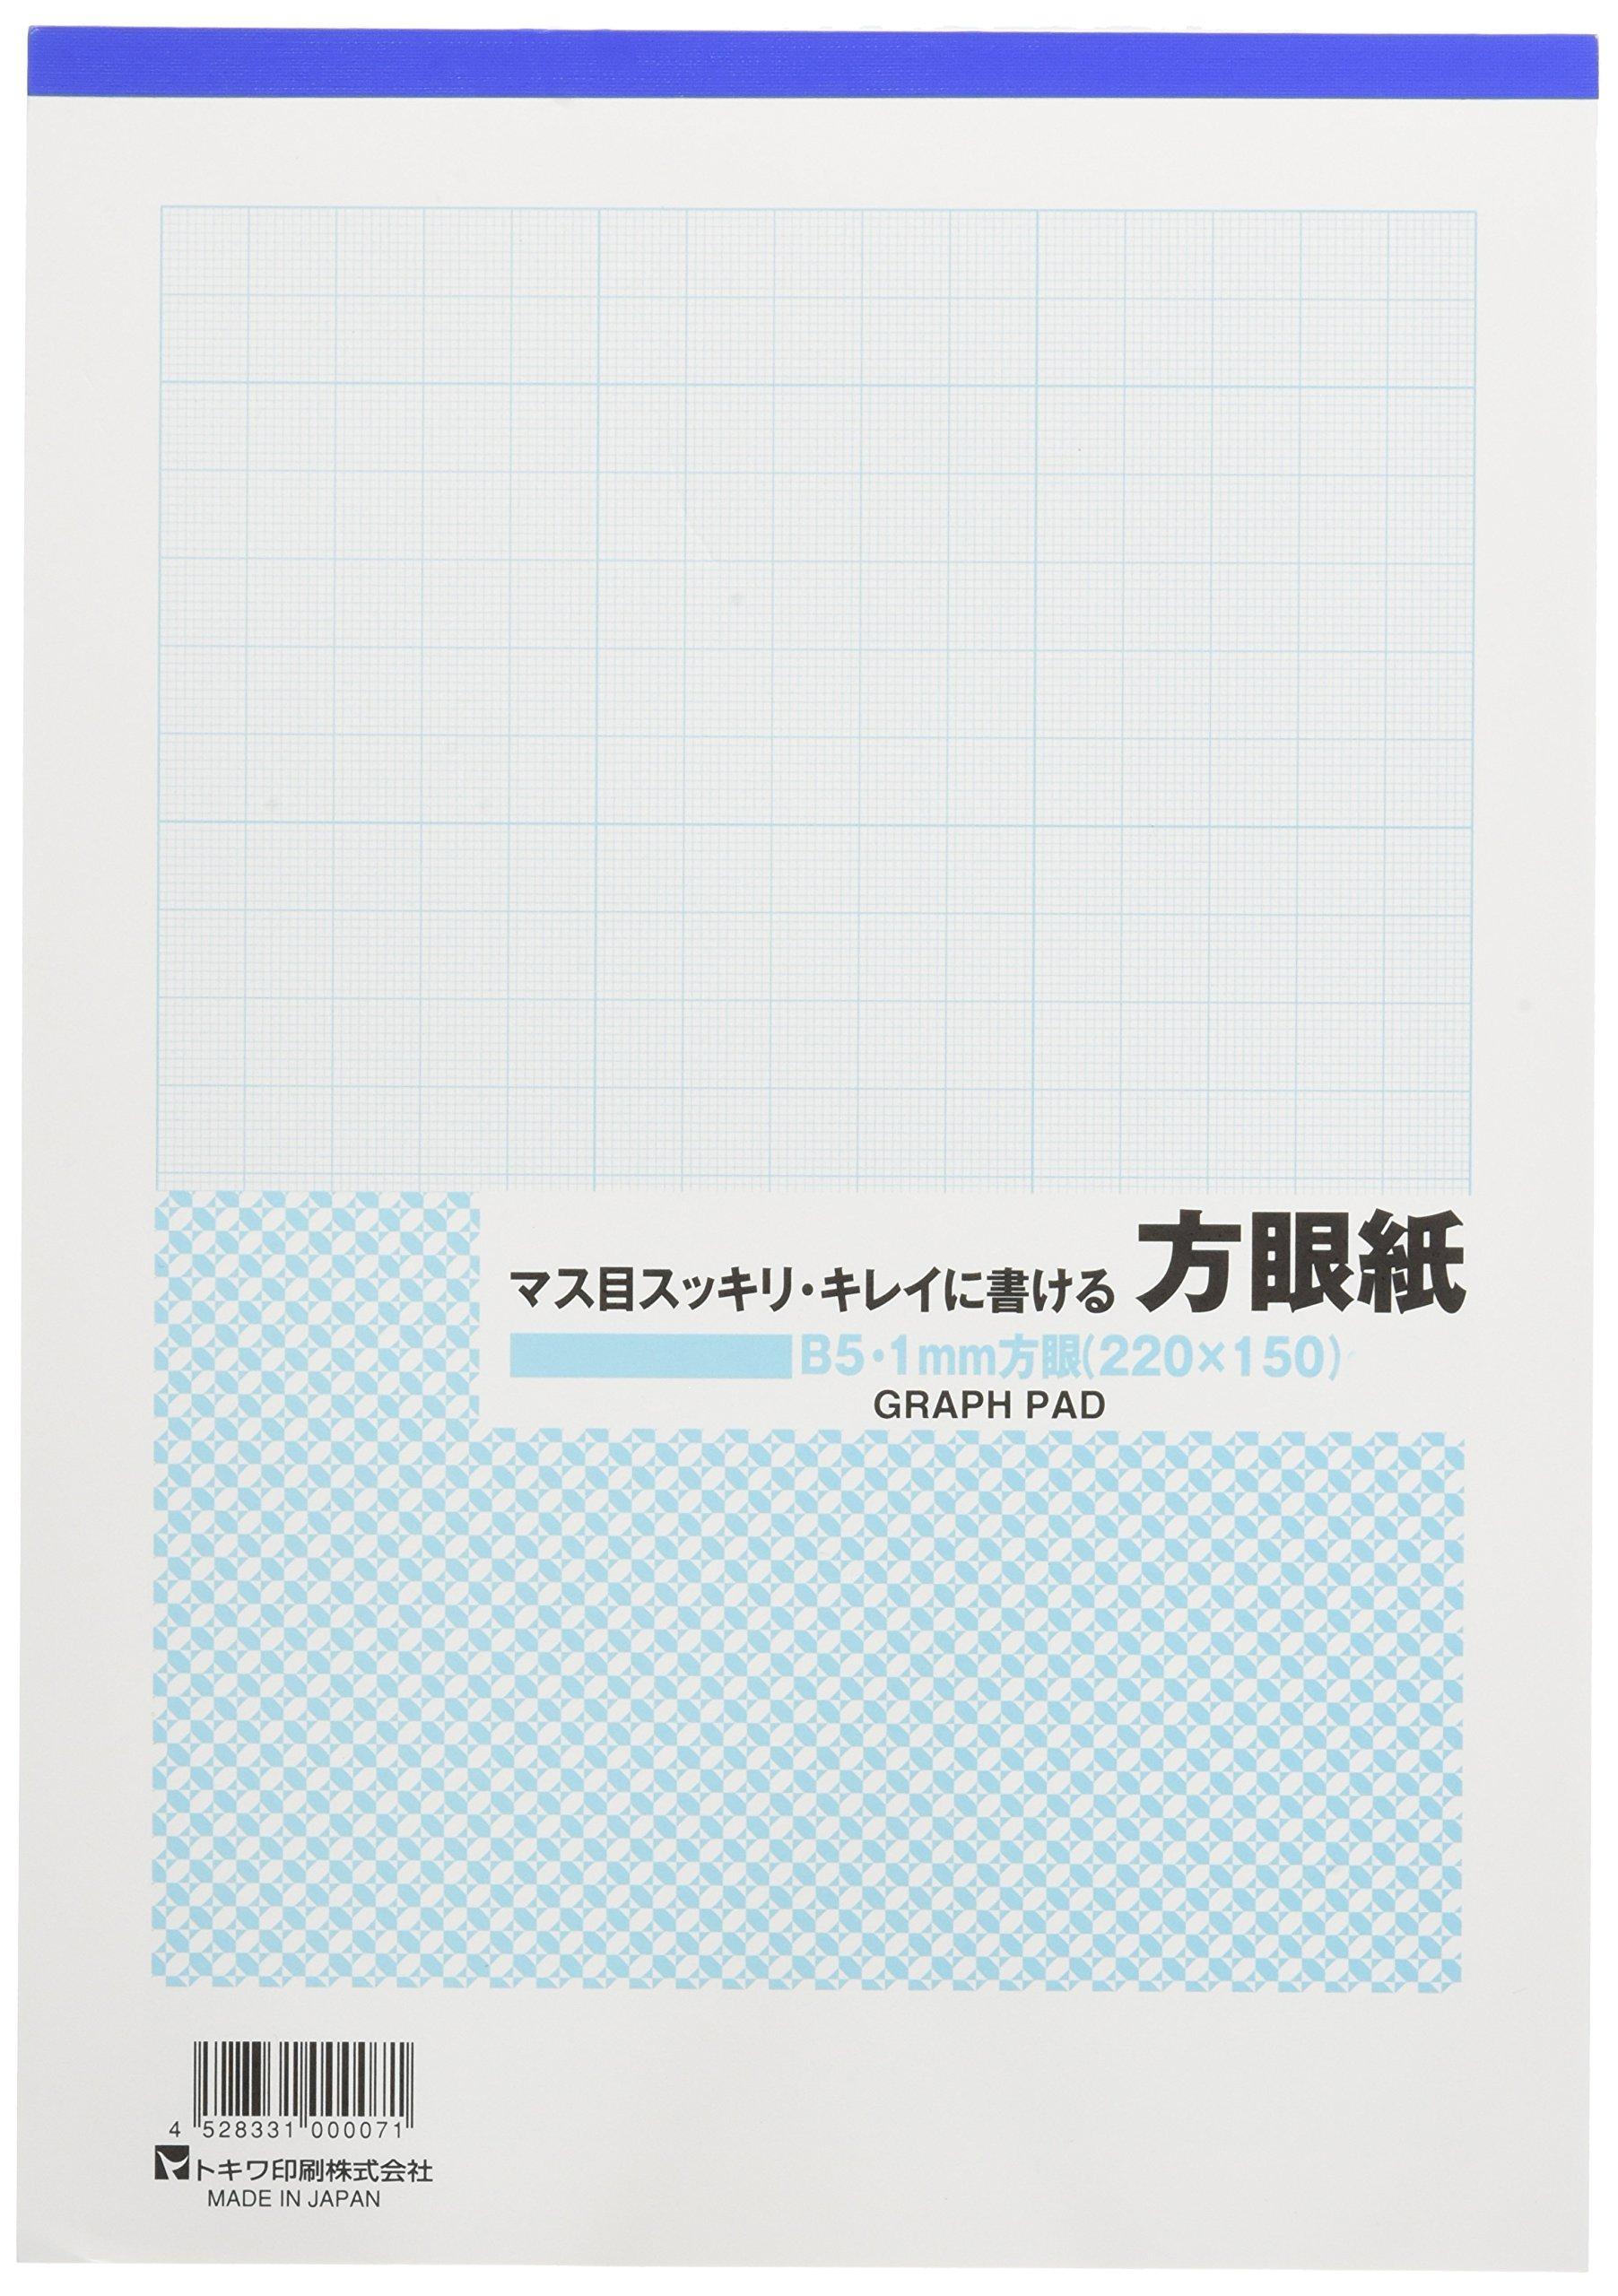 San notebook graph paper 548 B5 size 1mm grid 10 books set